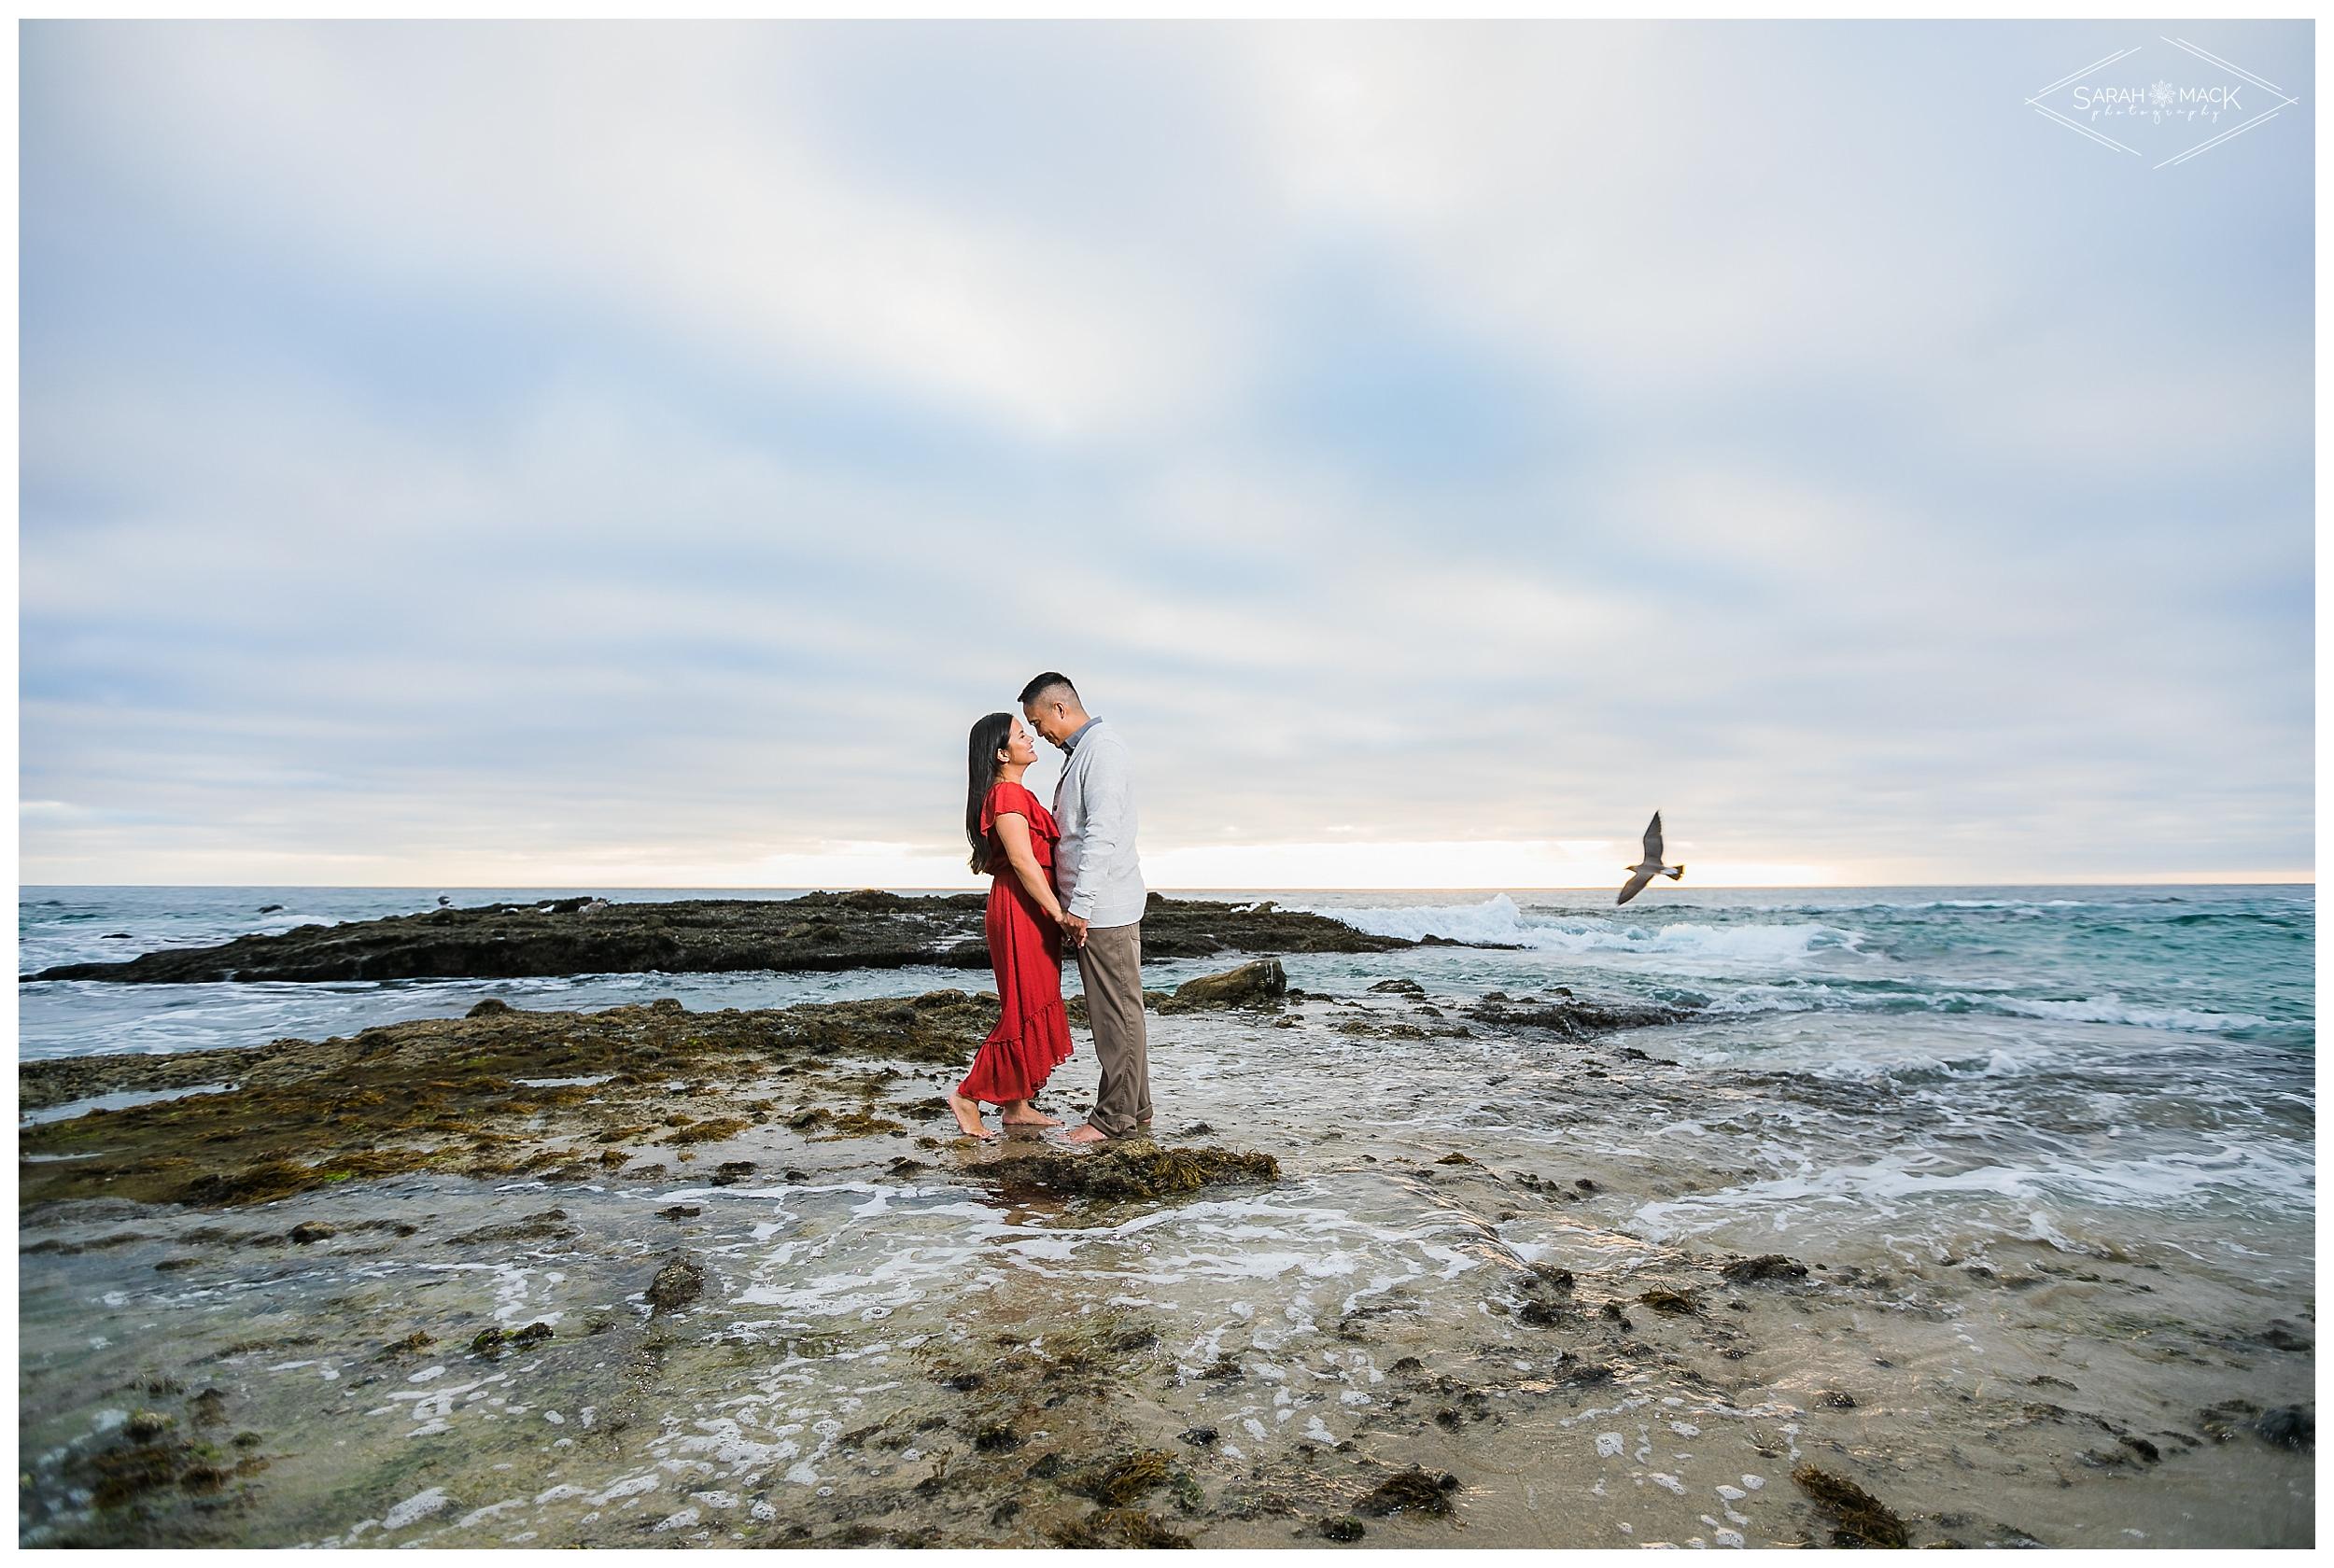 LE_Orange-County-Engagement-Photography 82.jpg